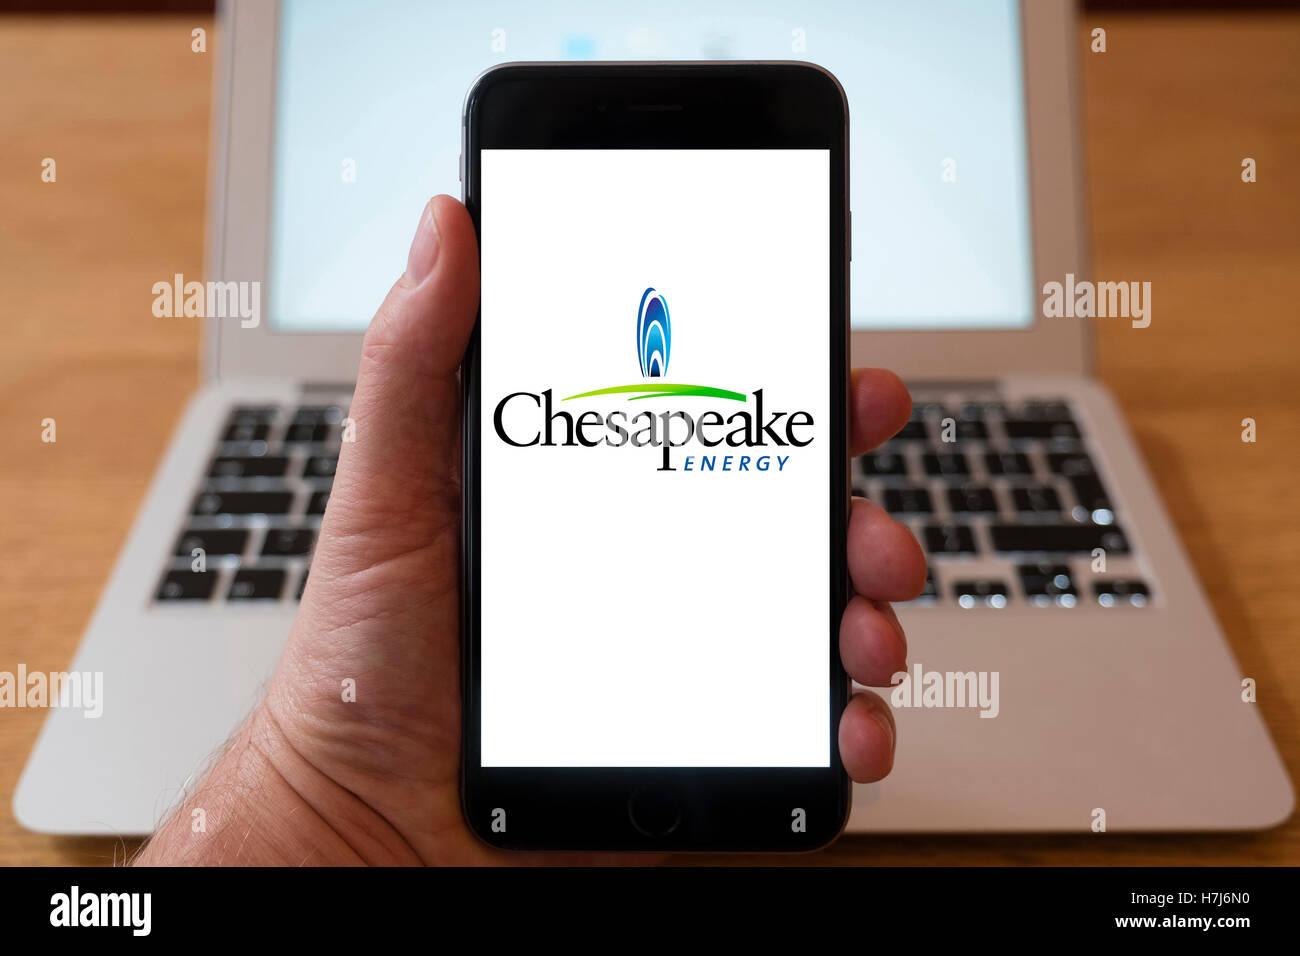 Using iPhone smart phone to display logo of Chesapeake energy company - Stock Image